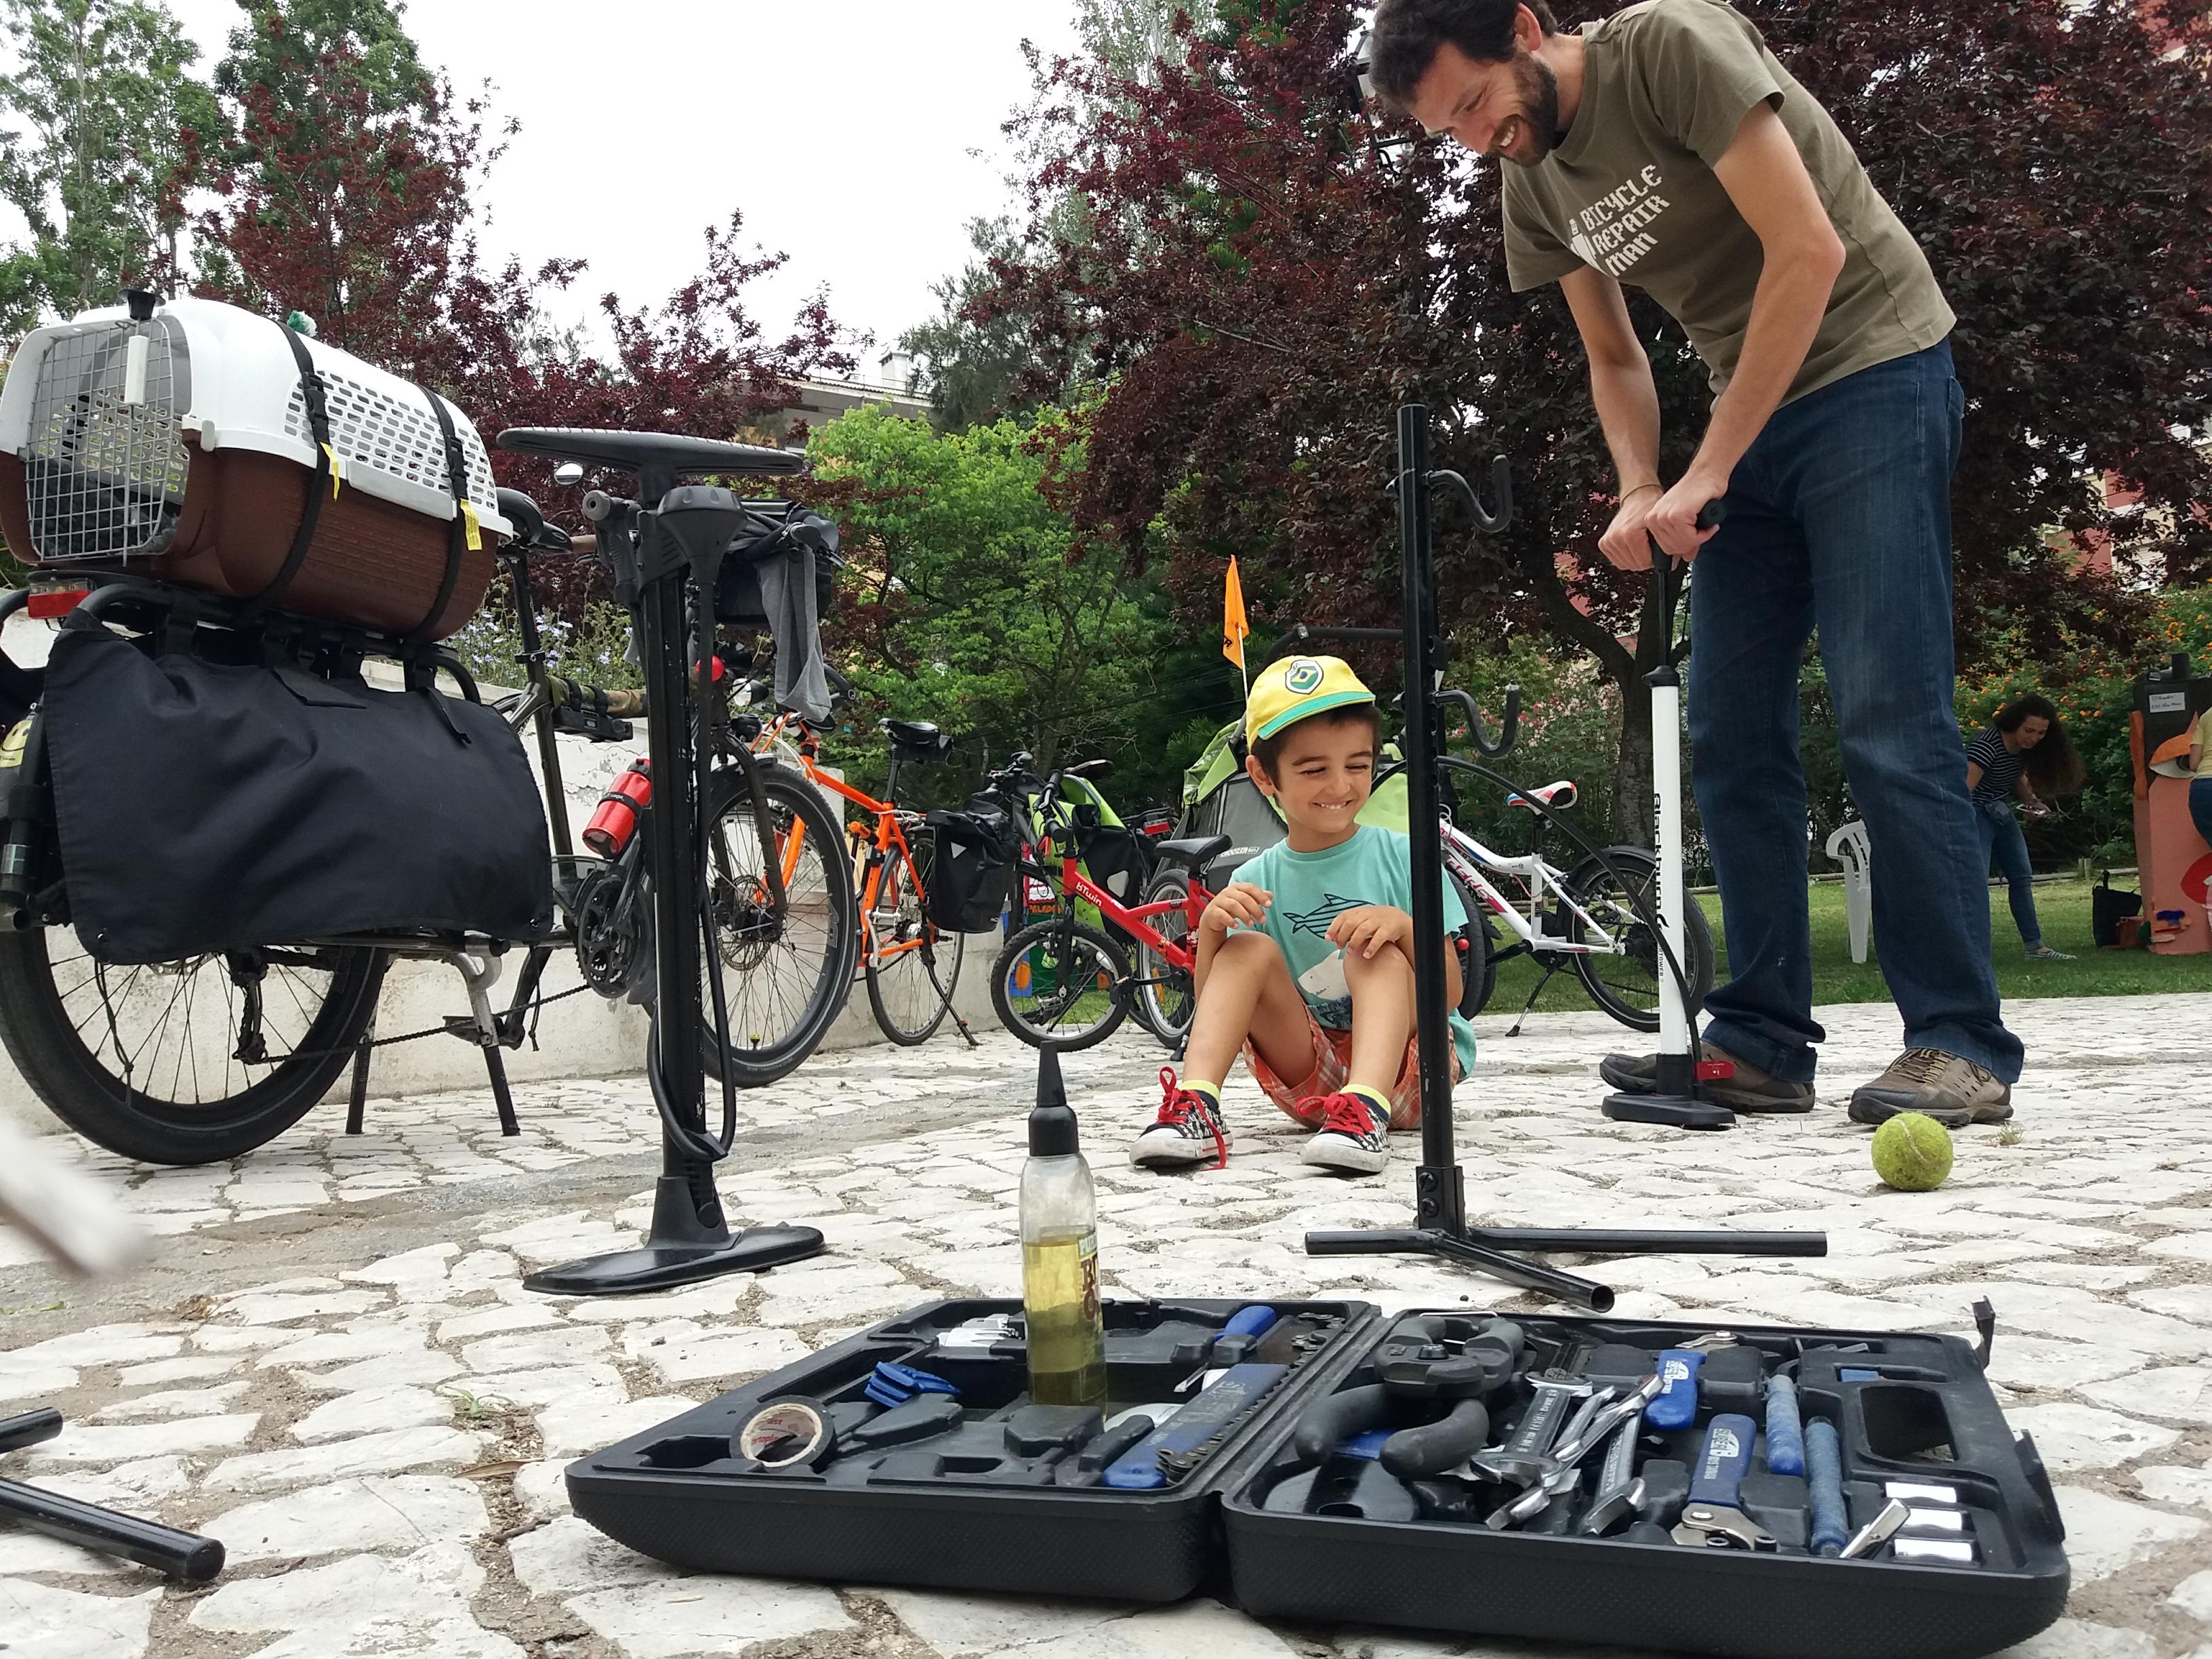 Photo credit: Cenas a Pedal on Visual Hunt